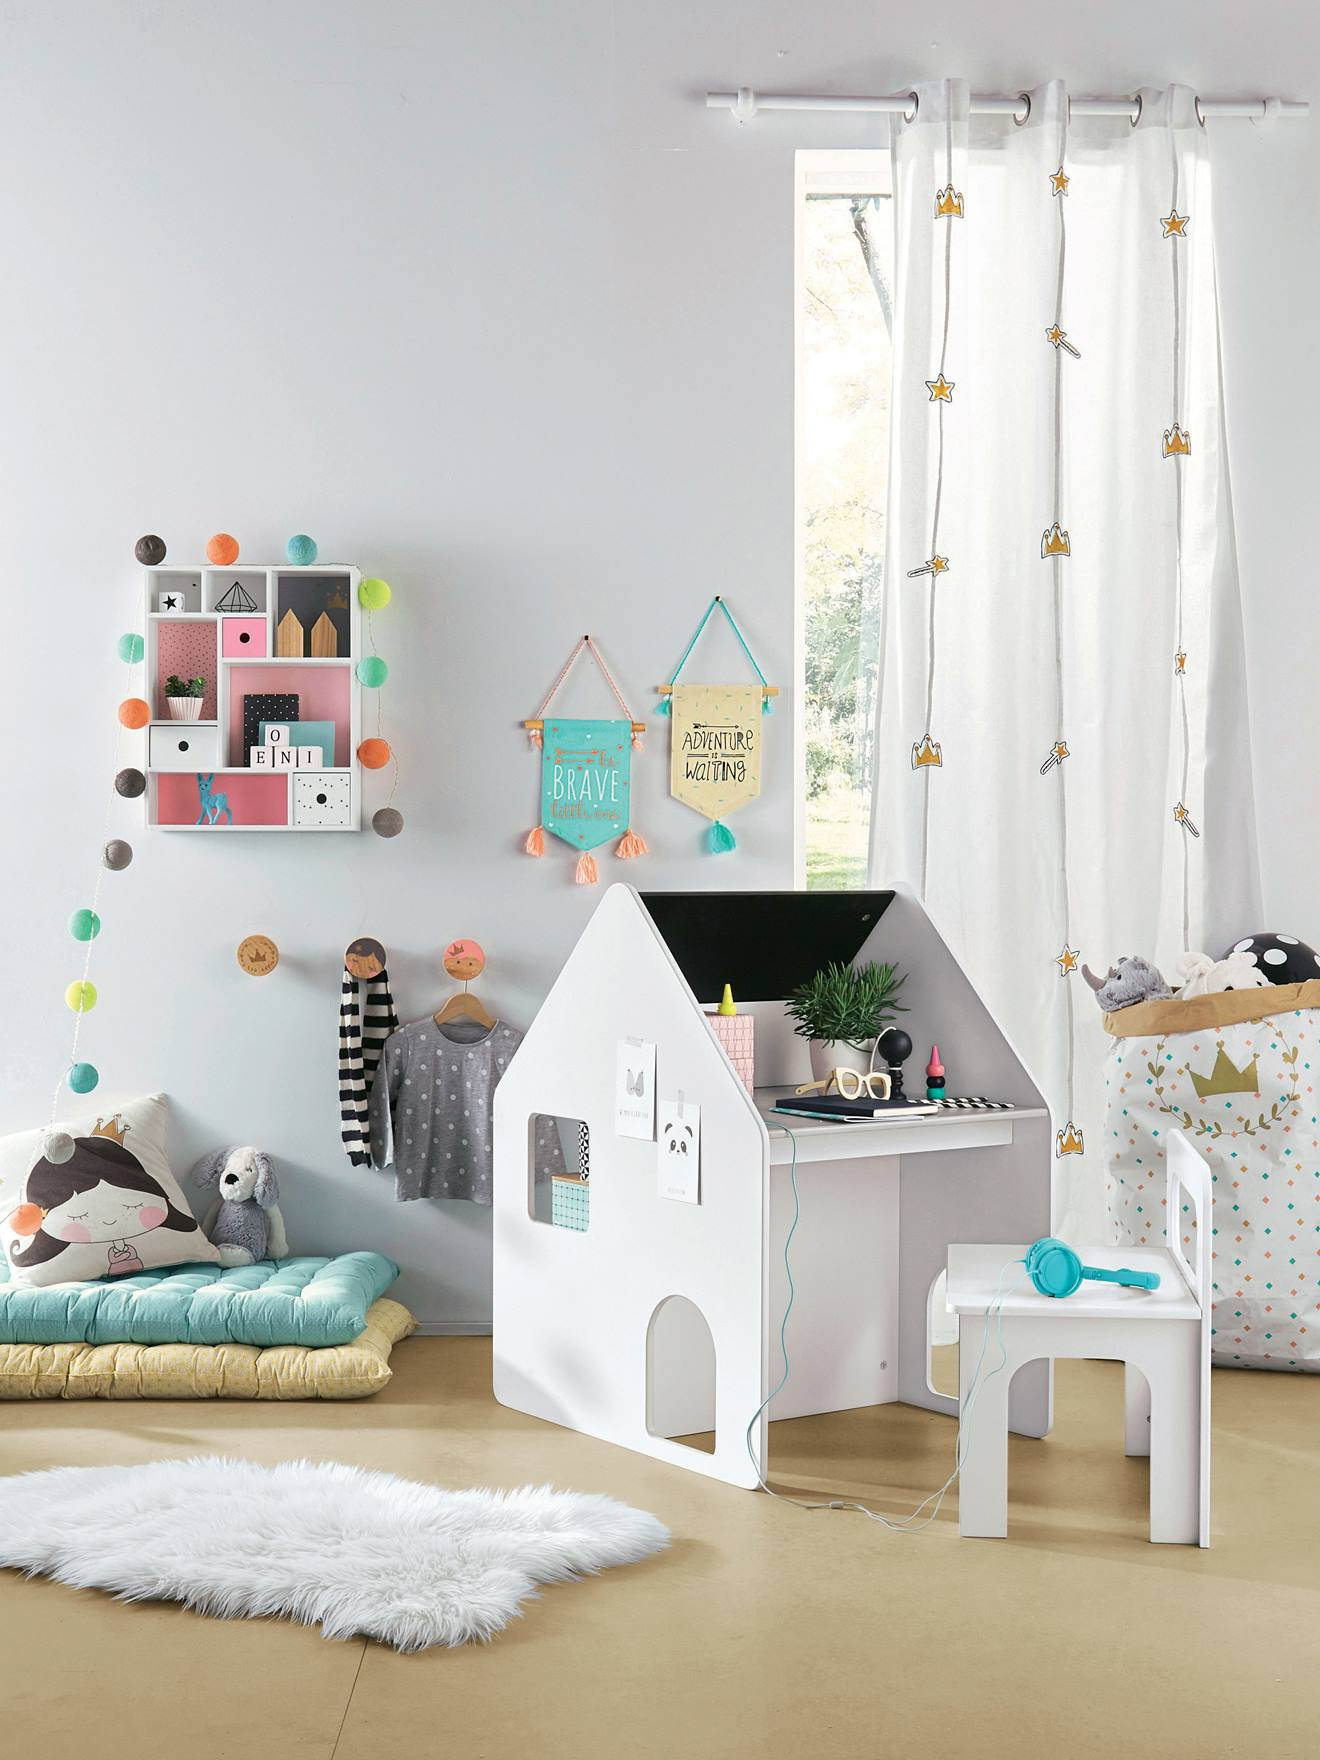 guirlande lumineuse chambre garon deco guirlande lumineuse chambre ado lumineuse chambre bebe. Black Bedroom Furniture Sets. Home Design Ideas